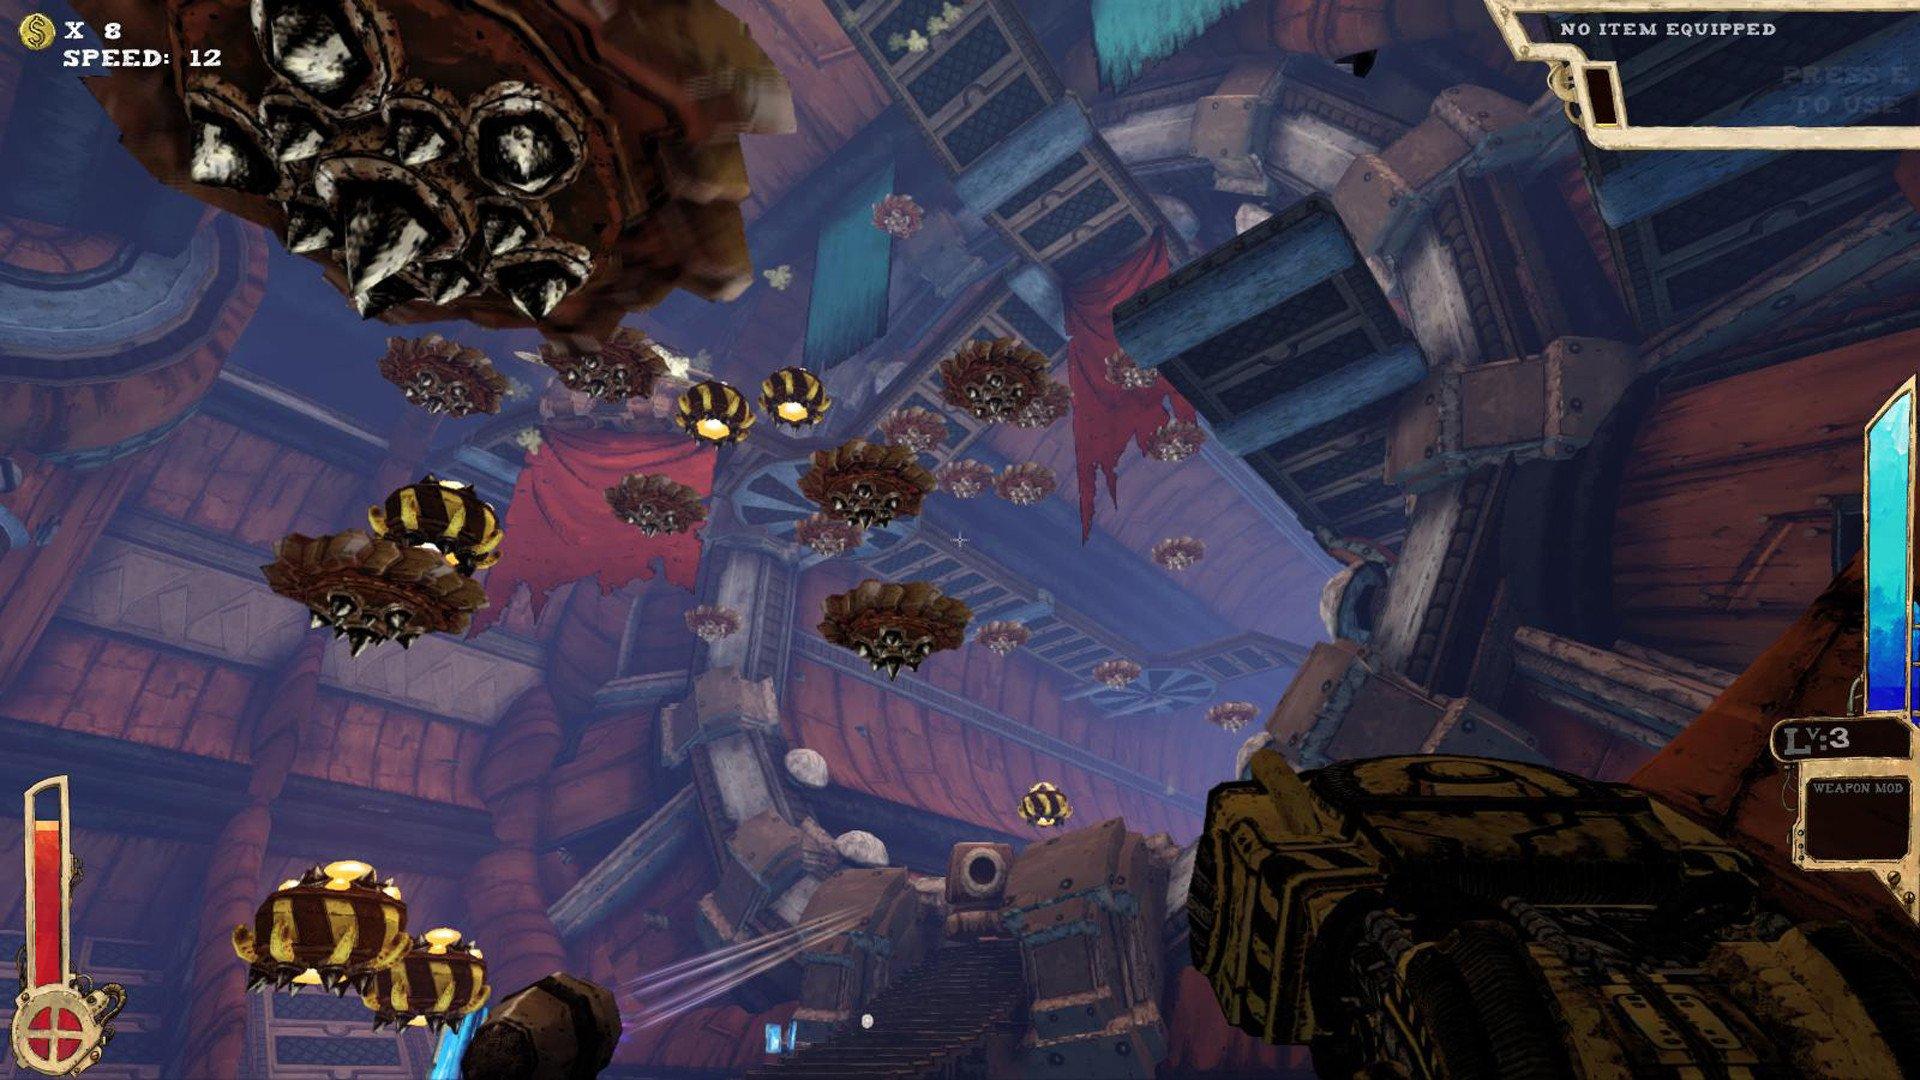 tower_of_guns-2468992.jpg